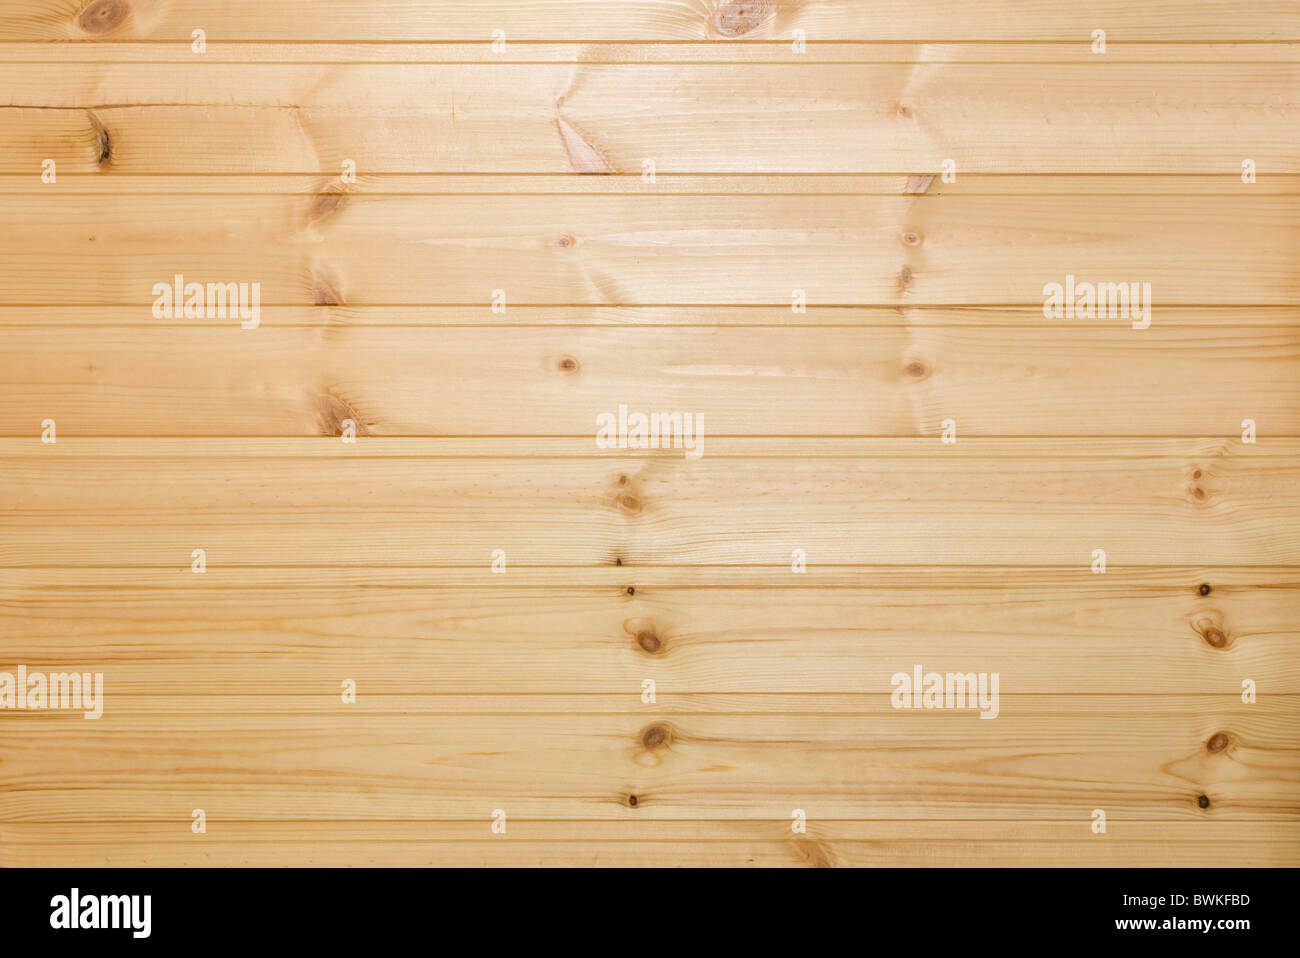 Conseils décoration lumineuse recouverte de vernis Photo Stock